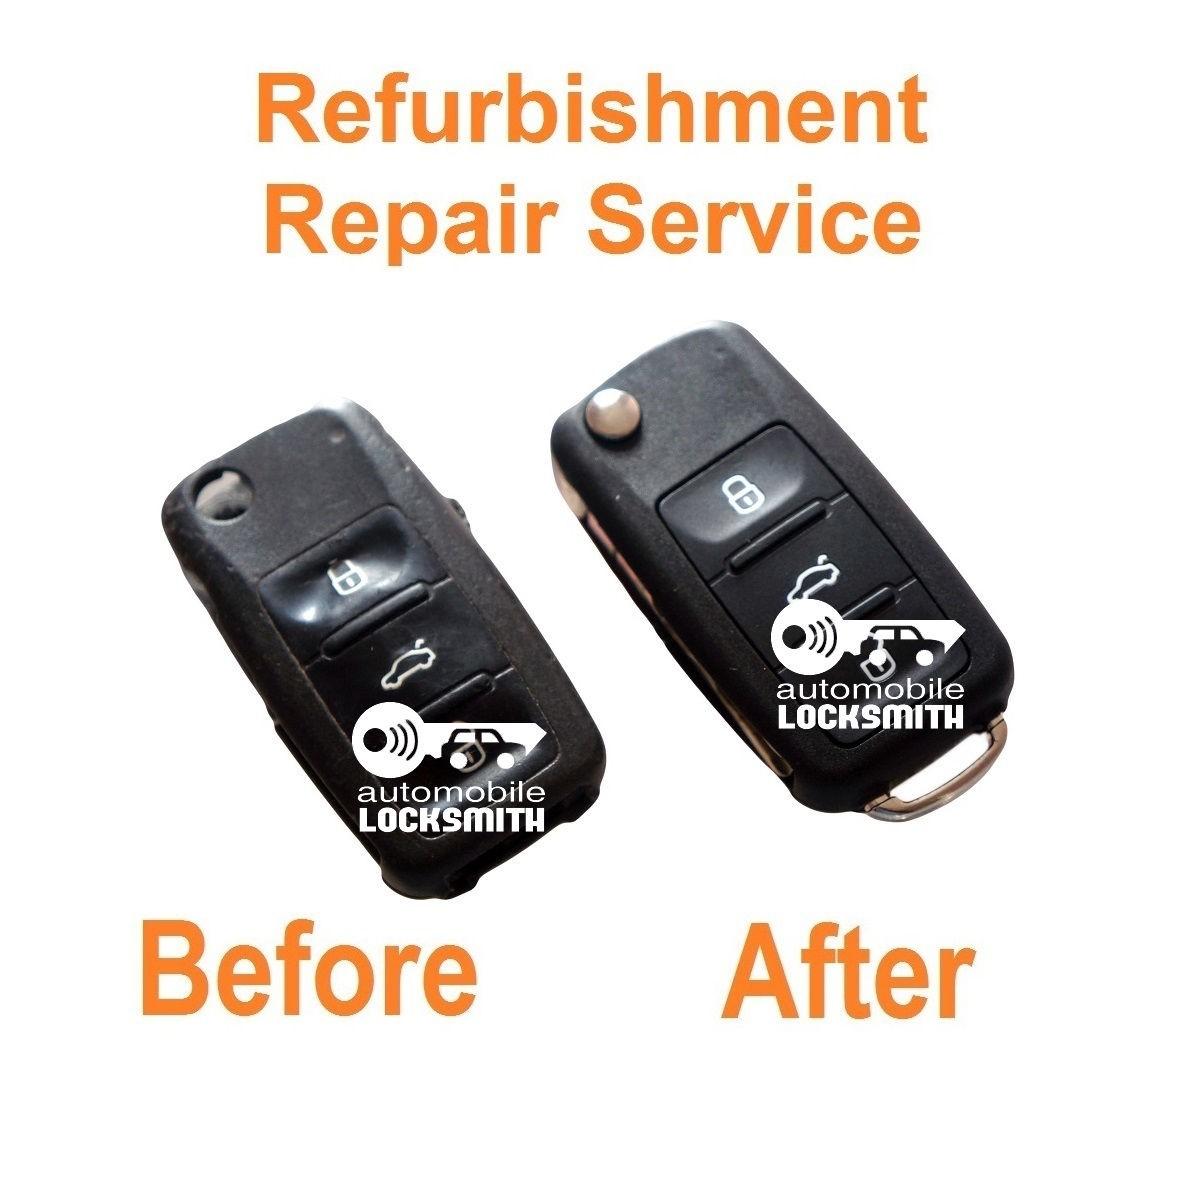 Repair Service for VW Volkswagen 3 Button Remote Flip Key